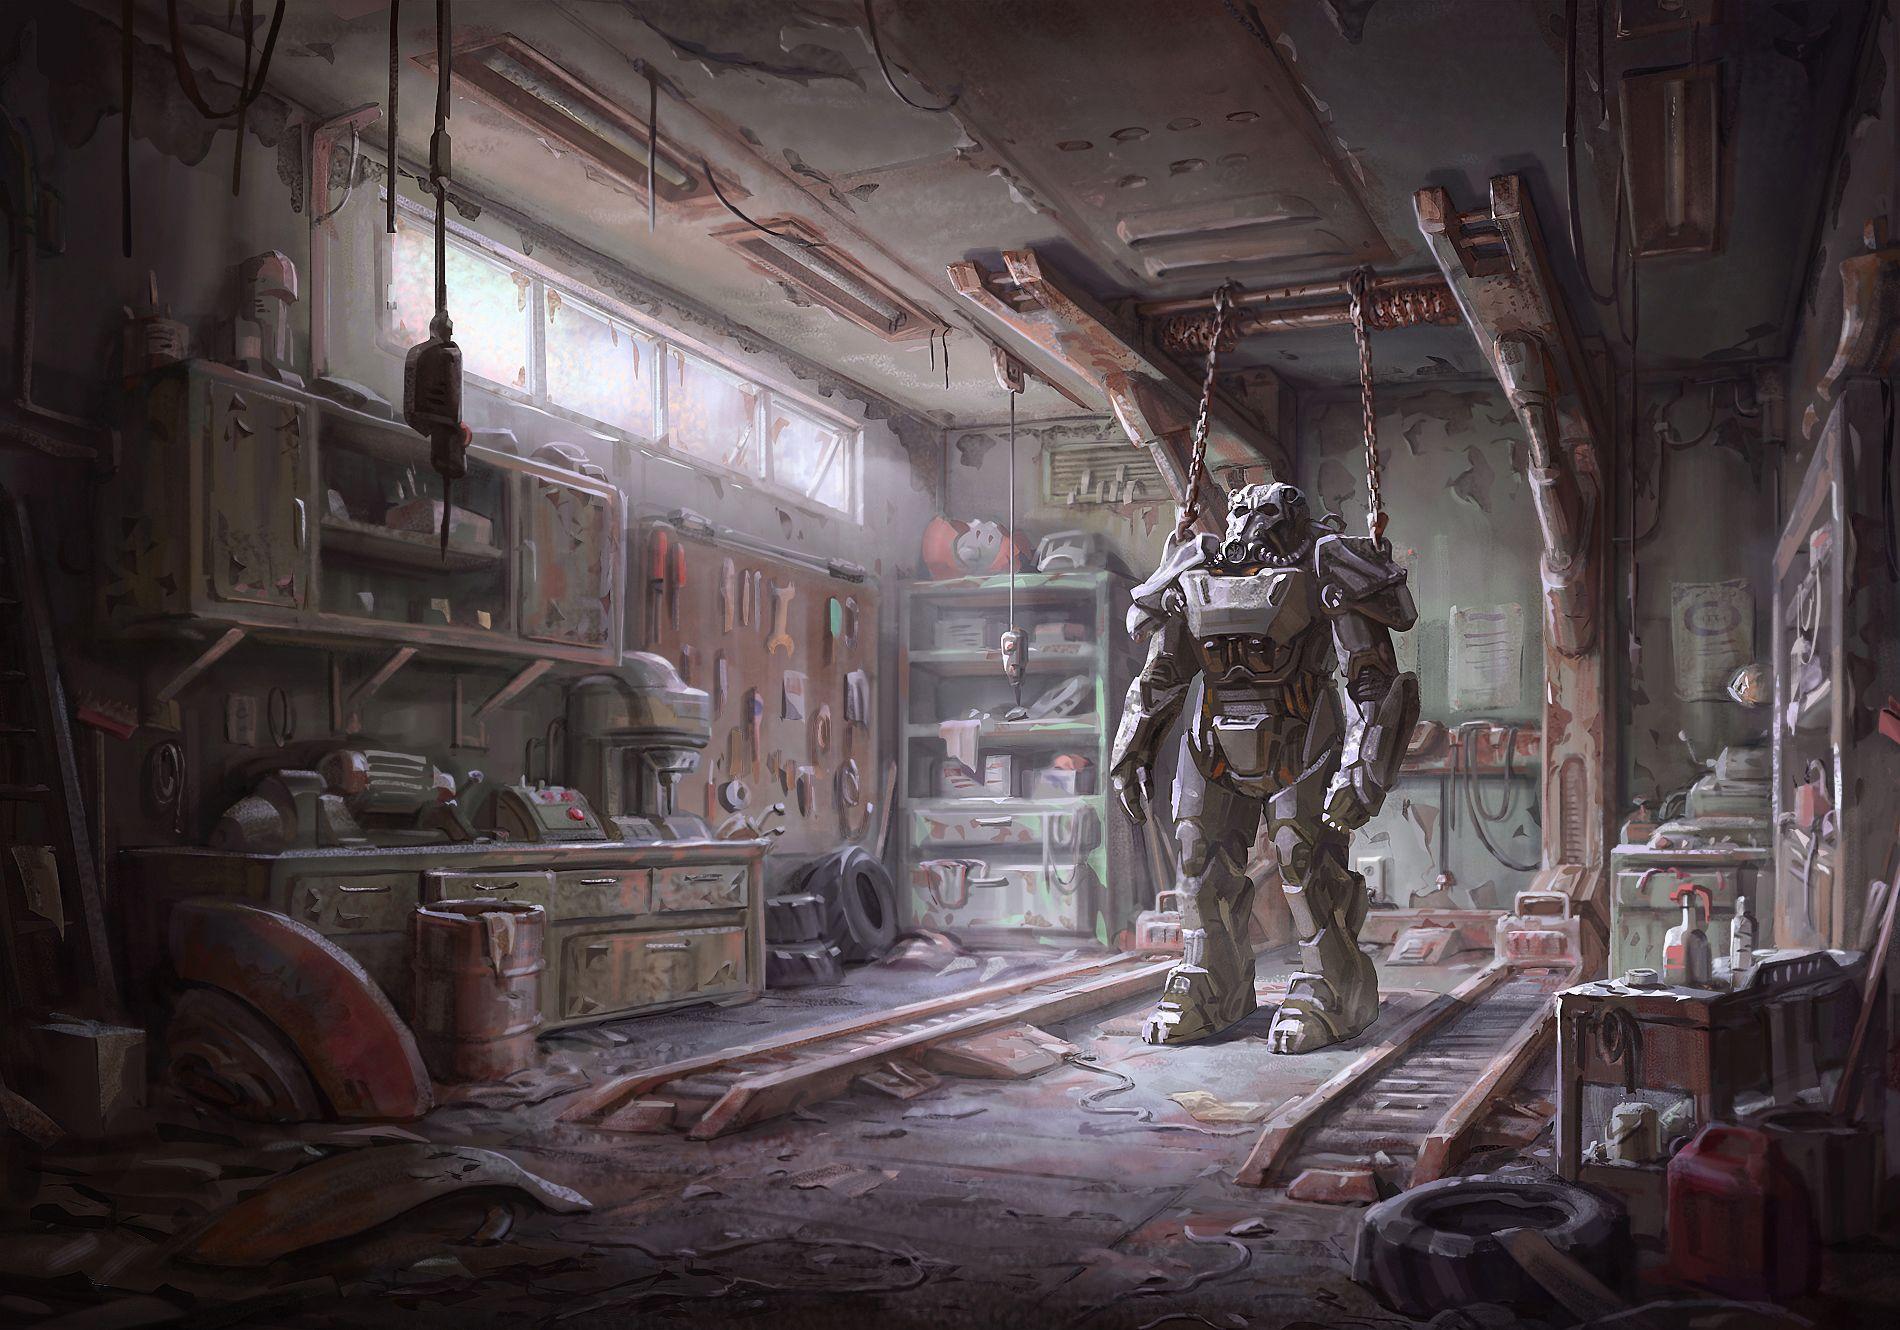 38 ] Fallout 4 Garage Wallpaper on WallpaperSafari